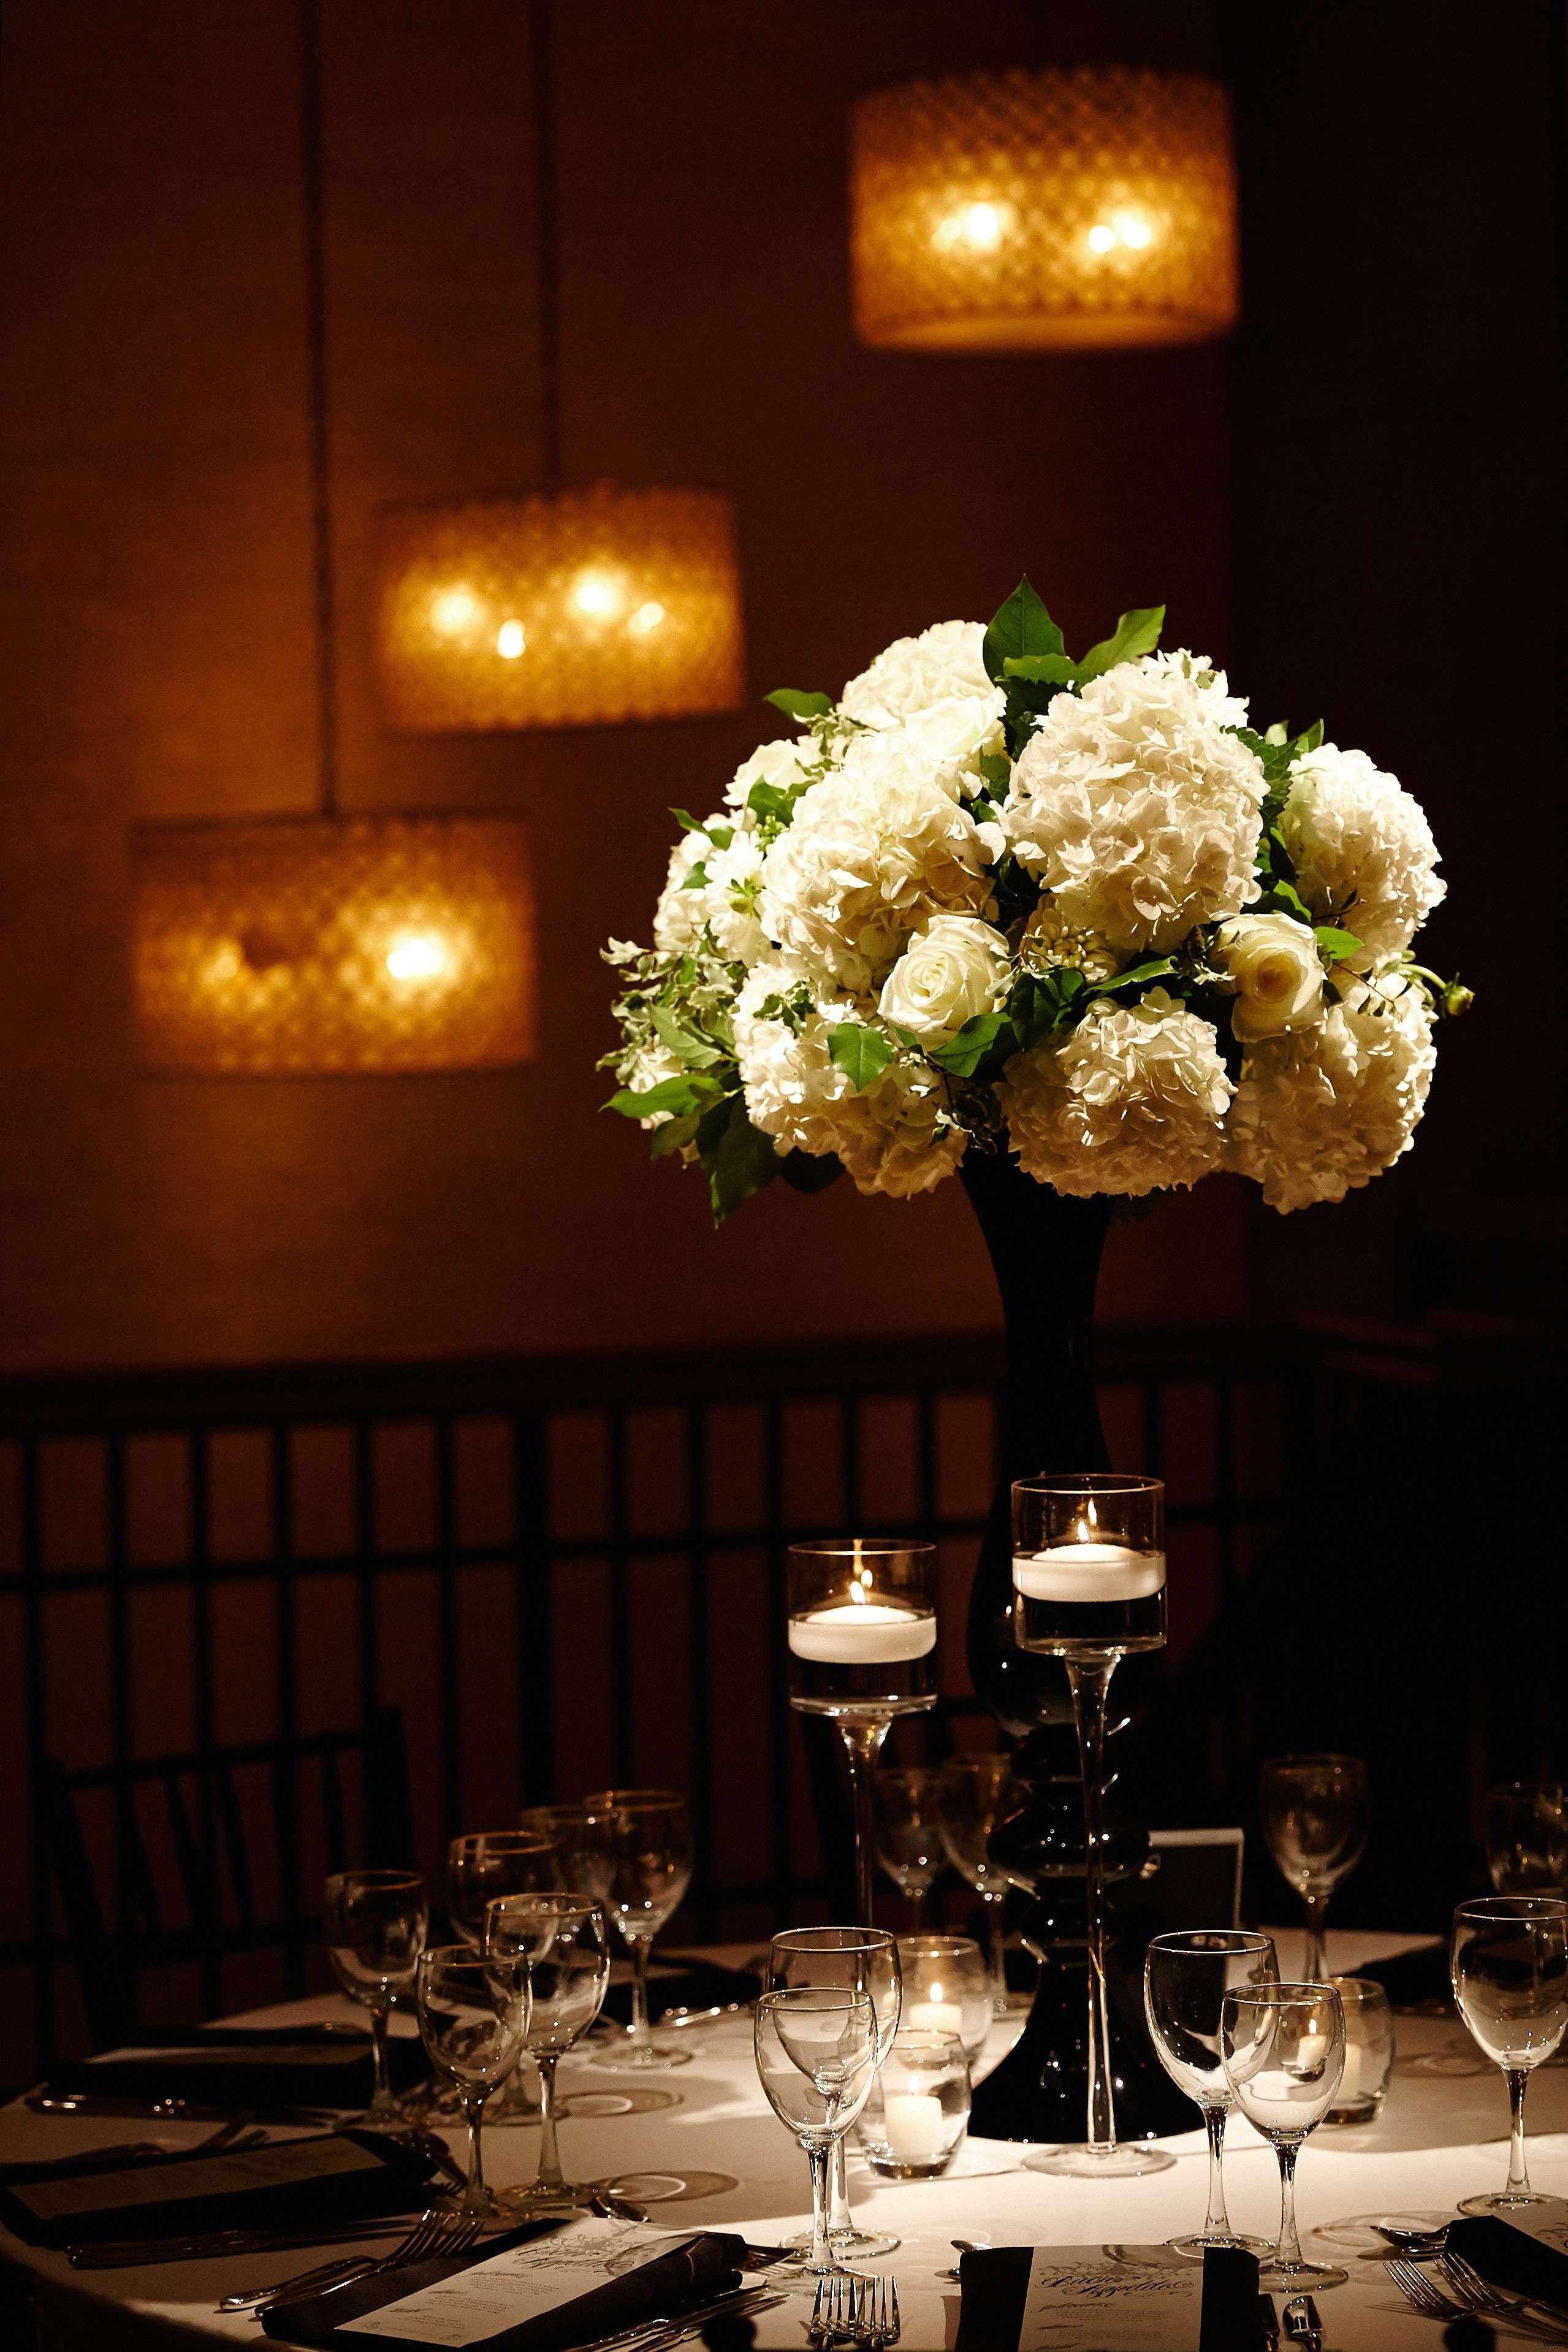 white flowers in clear vase of 10 best of small white flower vase bogekompresorturkiye com with regard to il fullxfull h vases black vase white flowers zoomi 0d with design design ideas vase